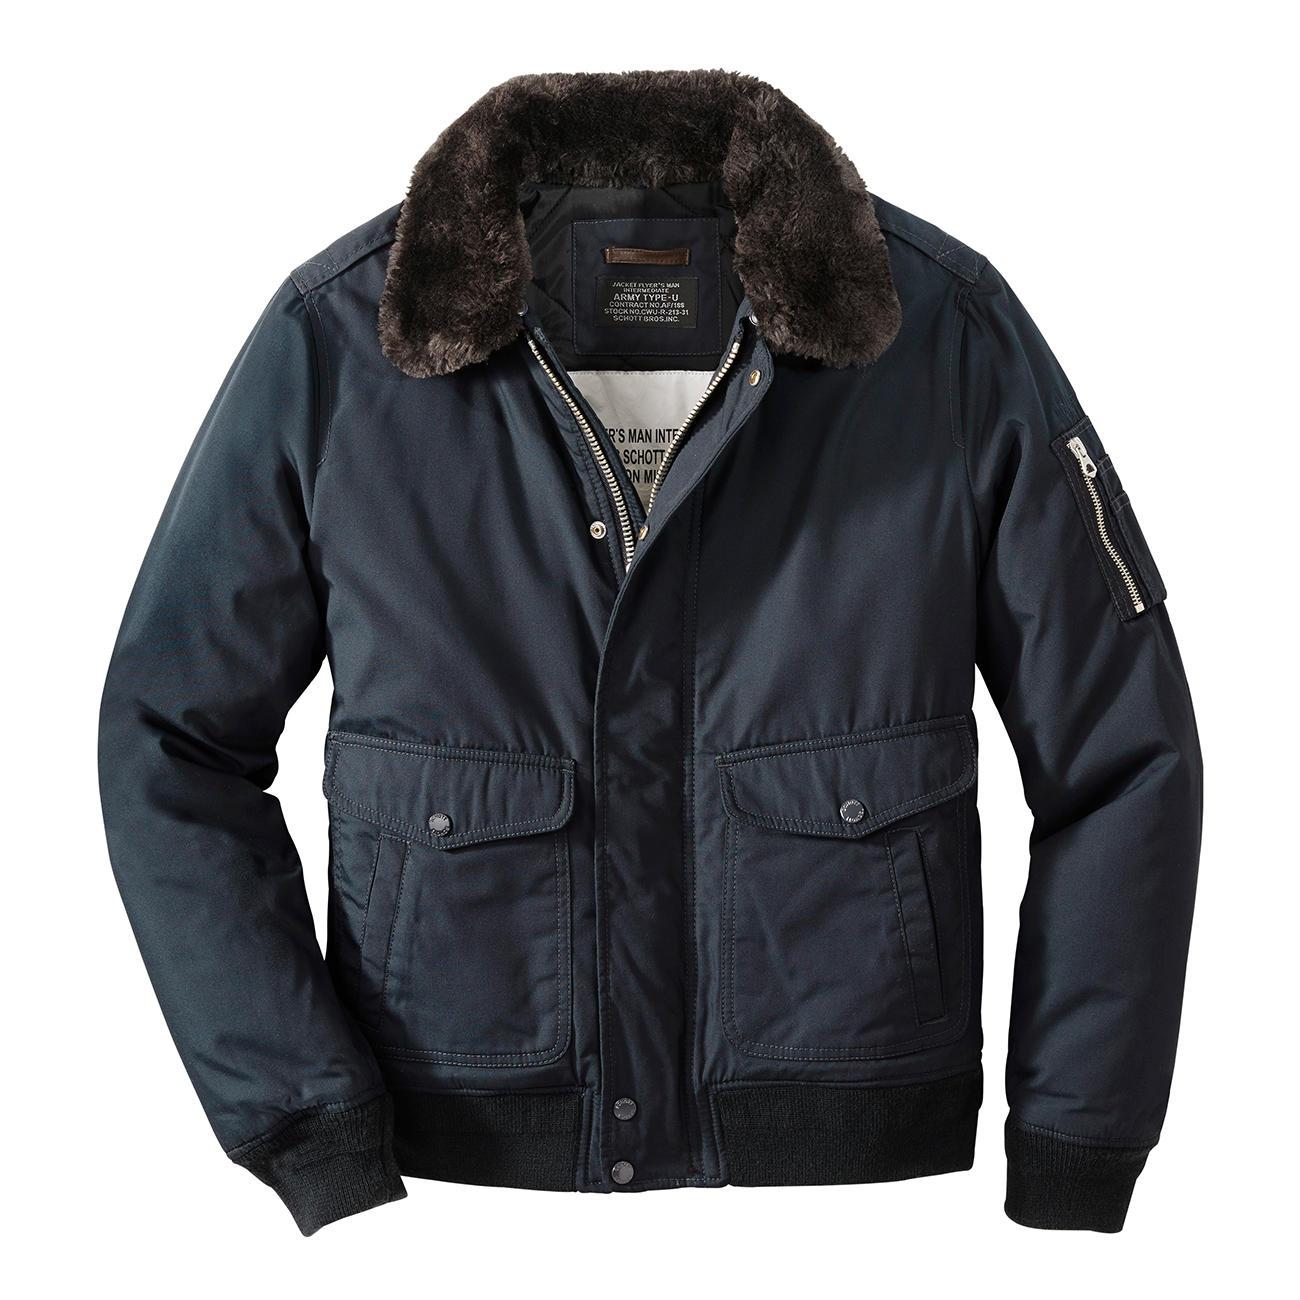 2019 Veste en cuir PU à col rabattu avec épaulette Brun XL